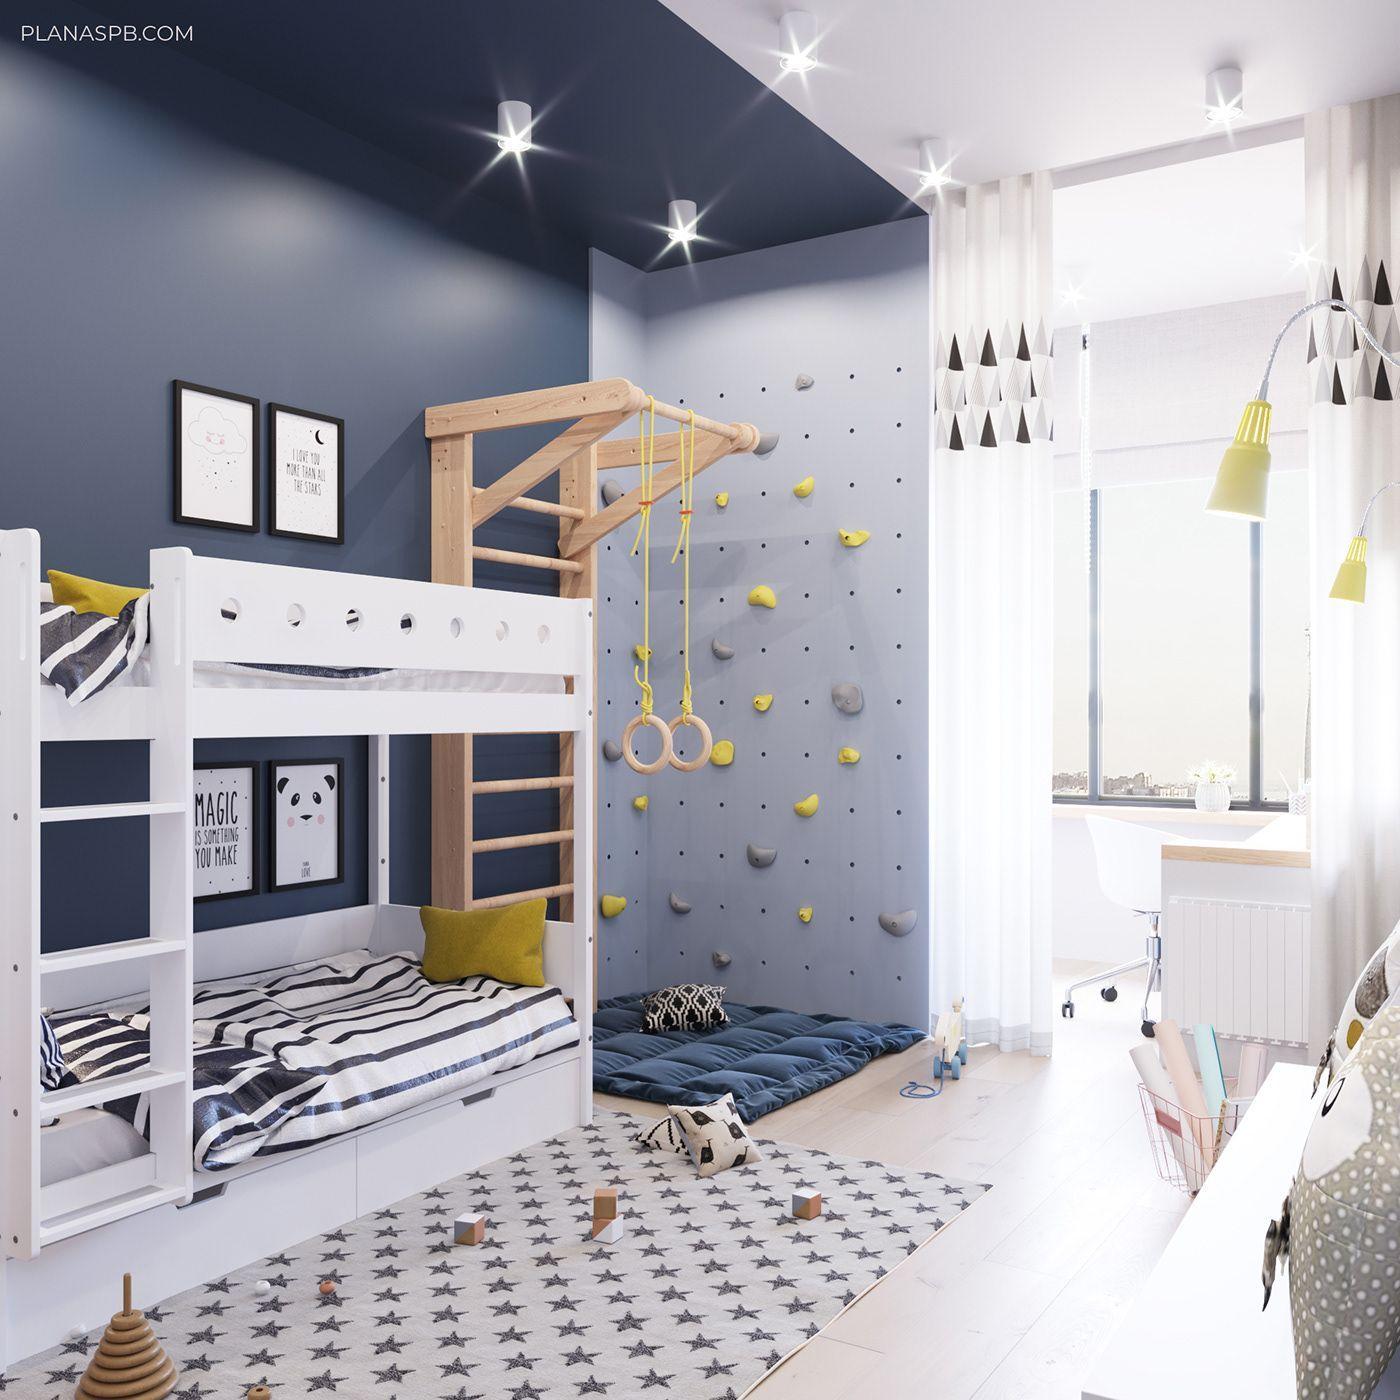 5 Most Fun Kid Room Design Ideas Cool Kids Rooms Kid Spaces